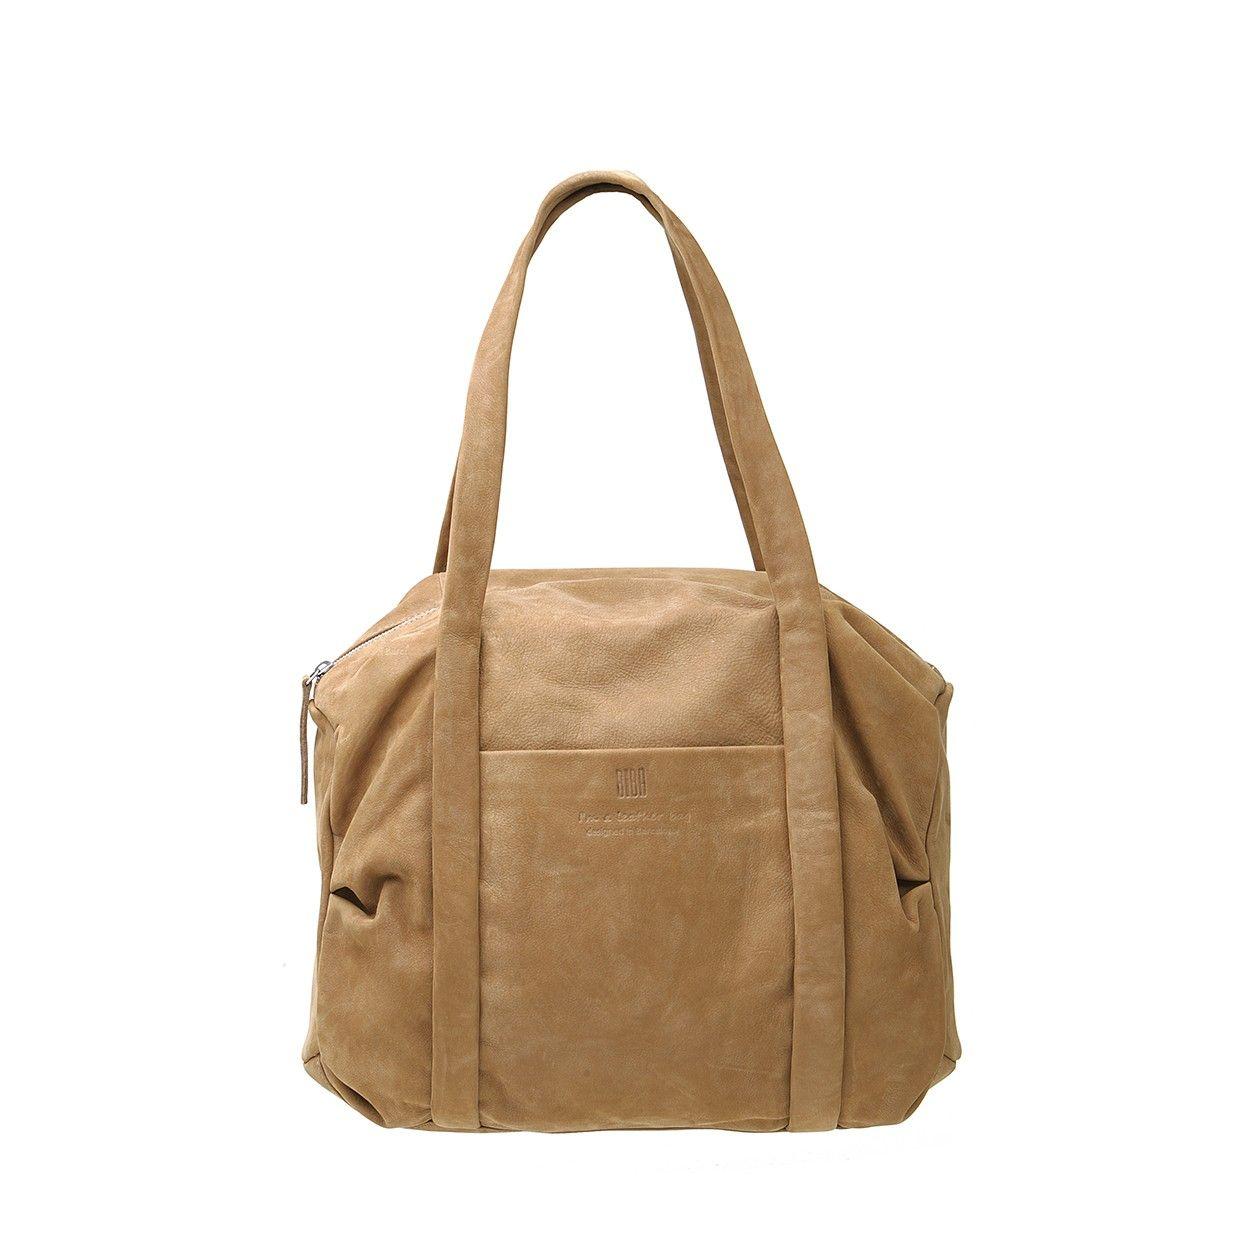 Bag Biba Lau2l Laurel Bags Leather Handbags Biba